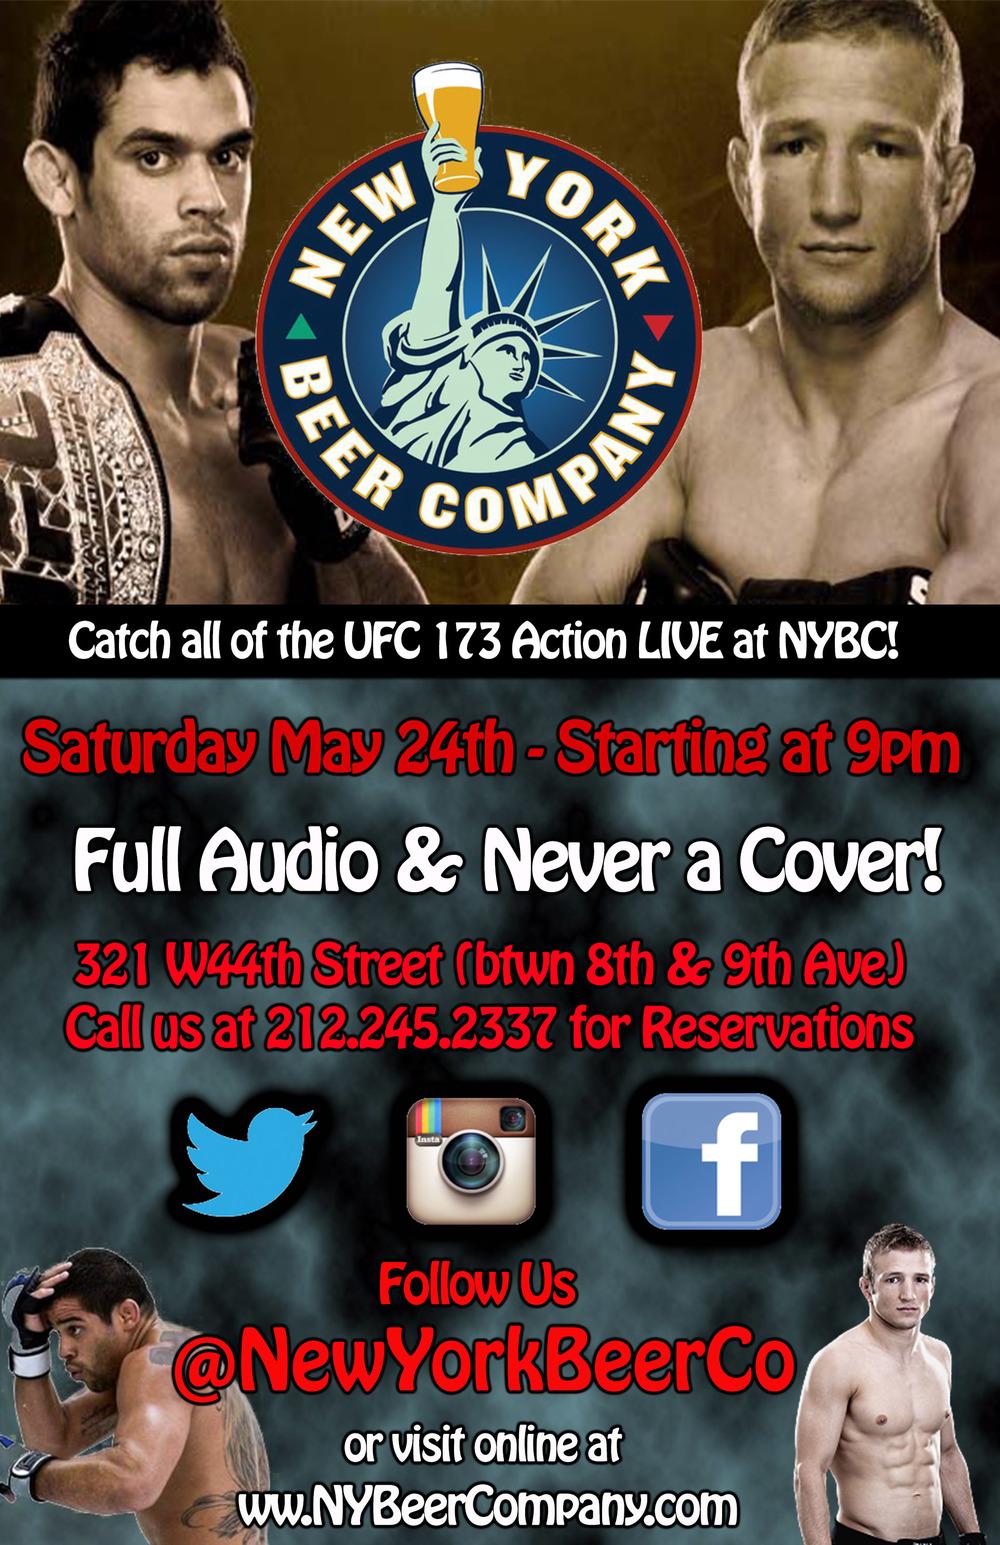 UFC173 Flyer - NYBC - JPG.jpg